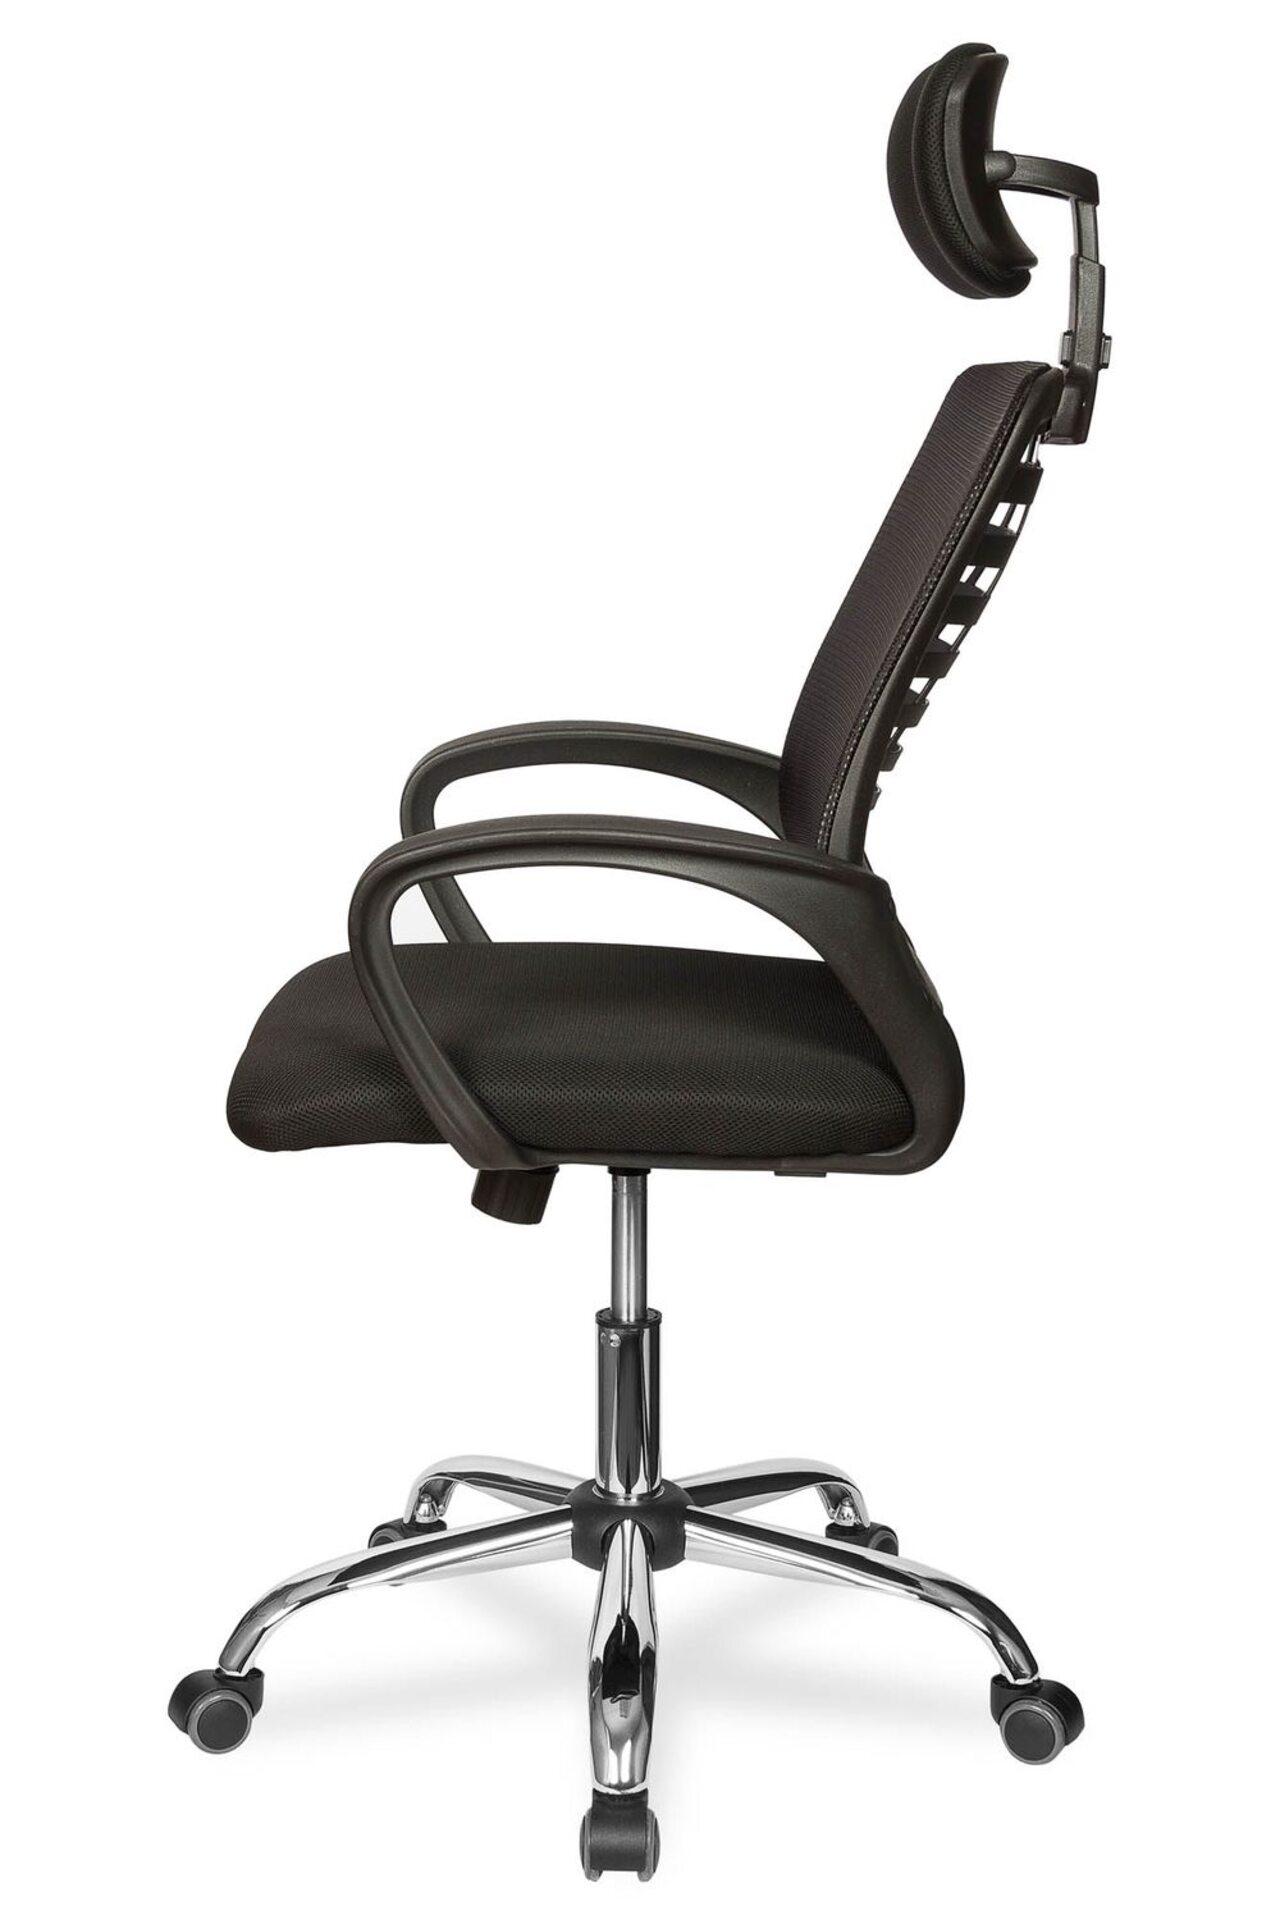 Кресло руководителя College CLG-422 MXH-A - фото 5